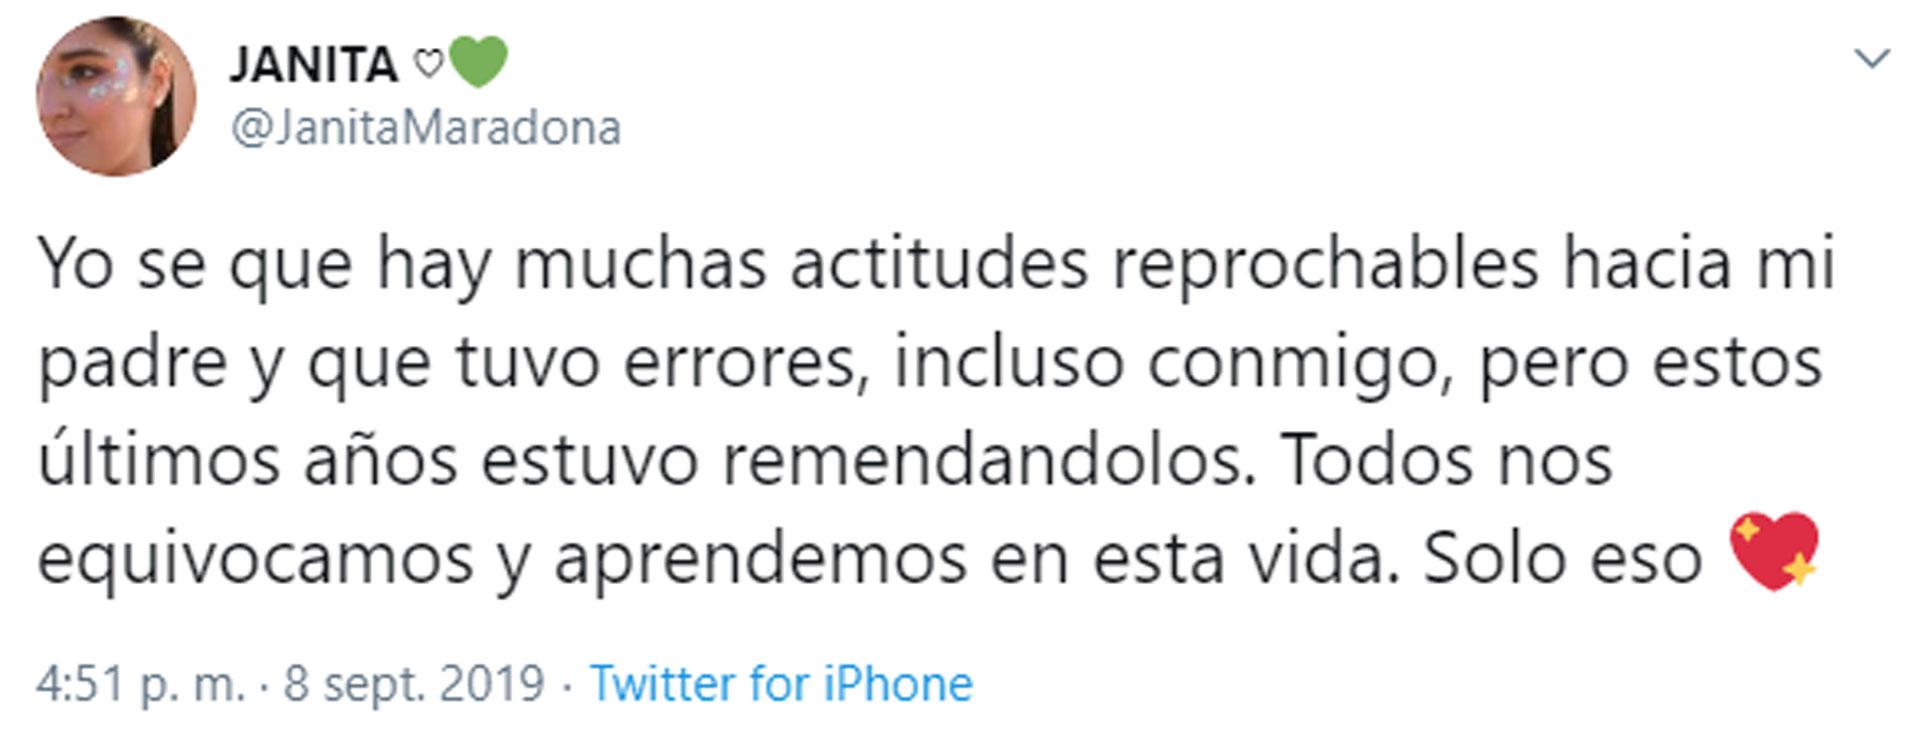 Jana Maradona defendió a su papá (Captura de Twitter)